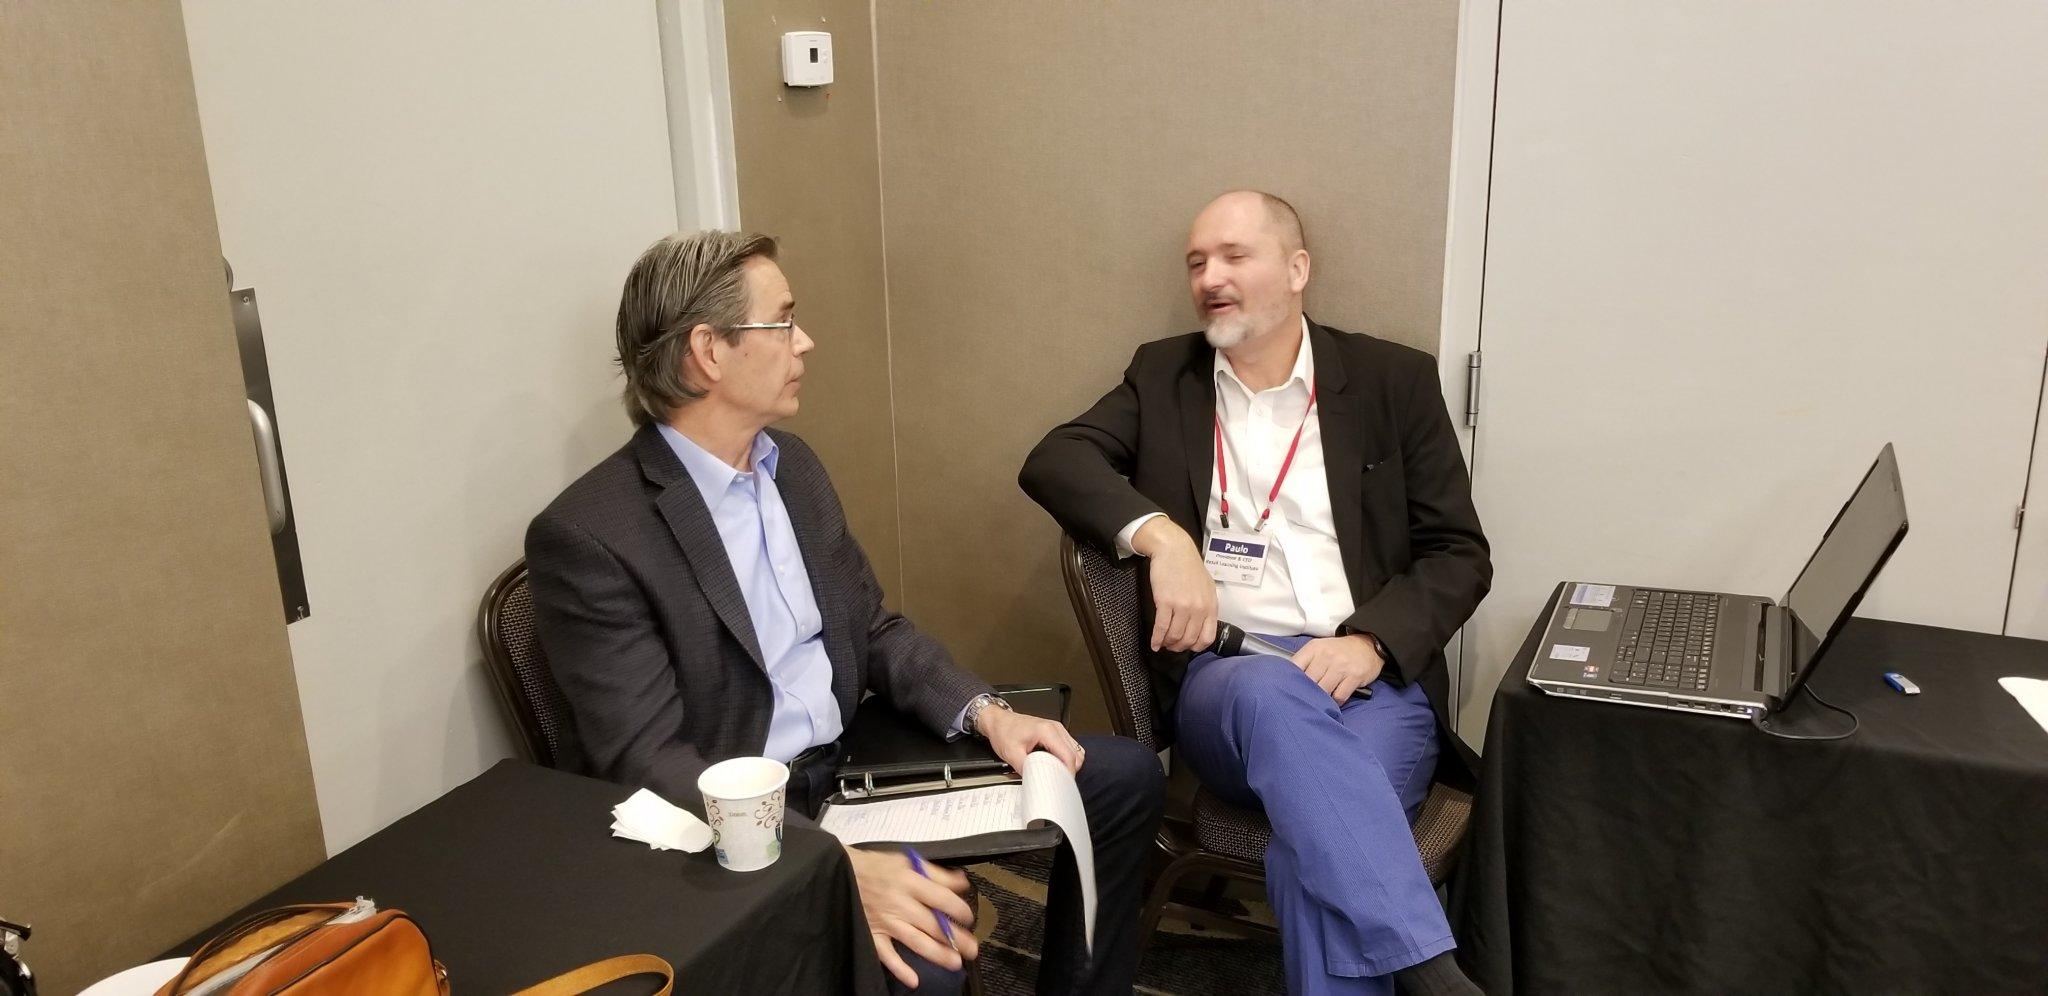 Harold Lloyd and Paulo Goelzer conversing